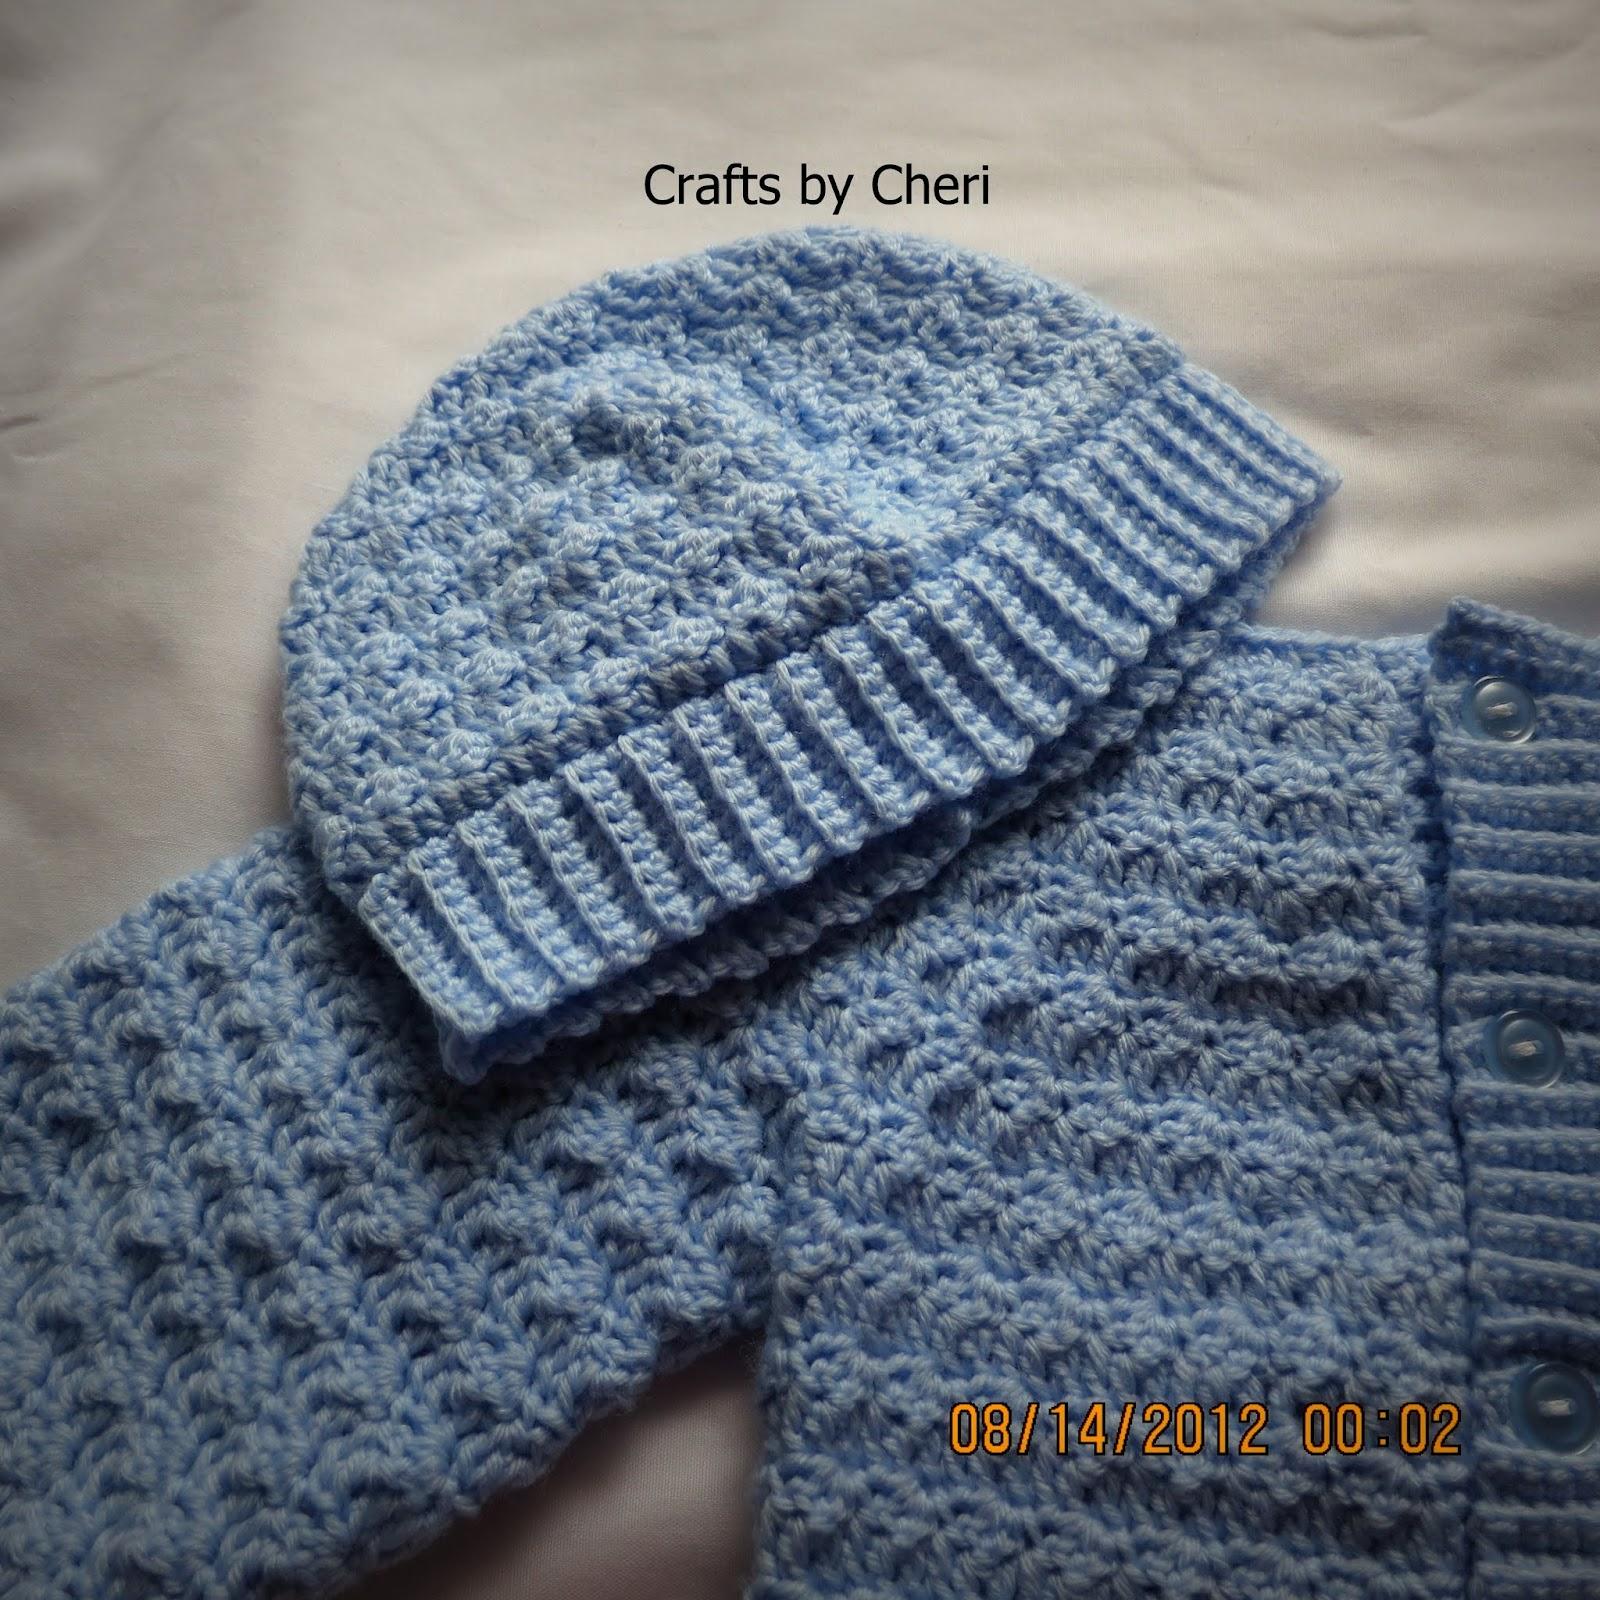 Cheri s Crochet Baby or reborn baby doll clothing or craftsbycheri